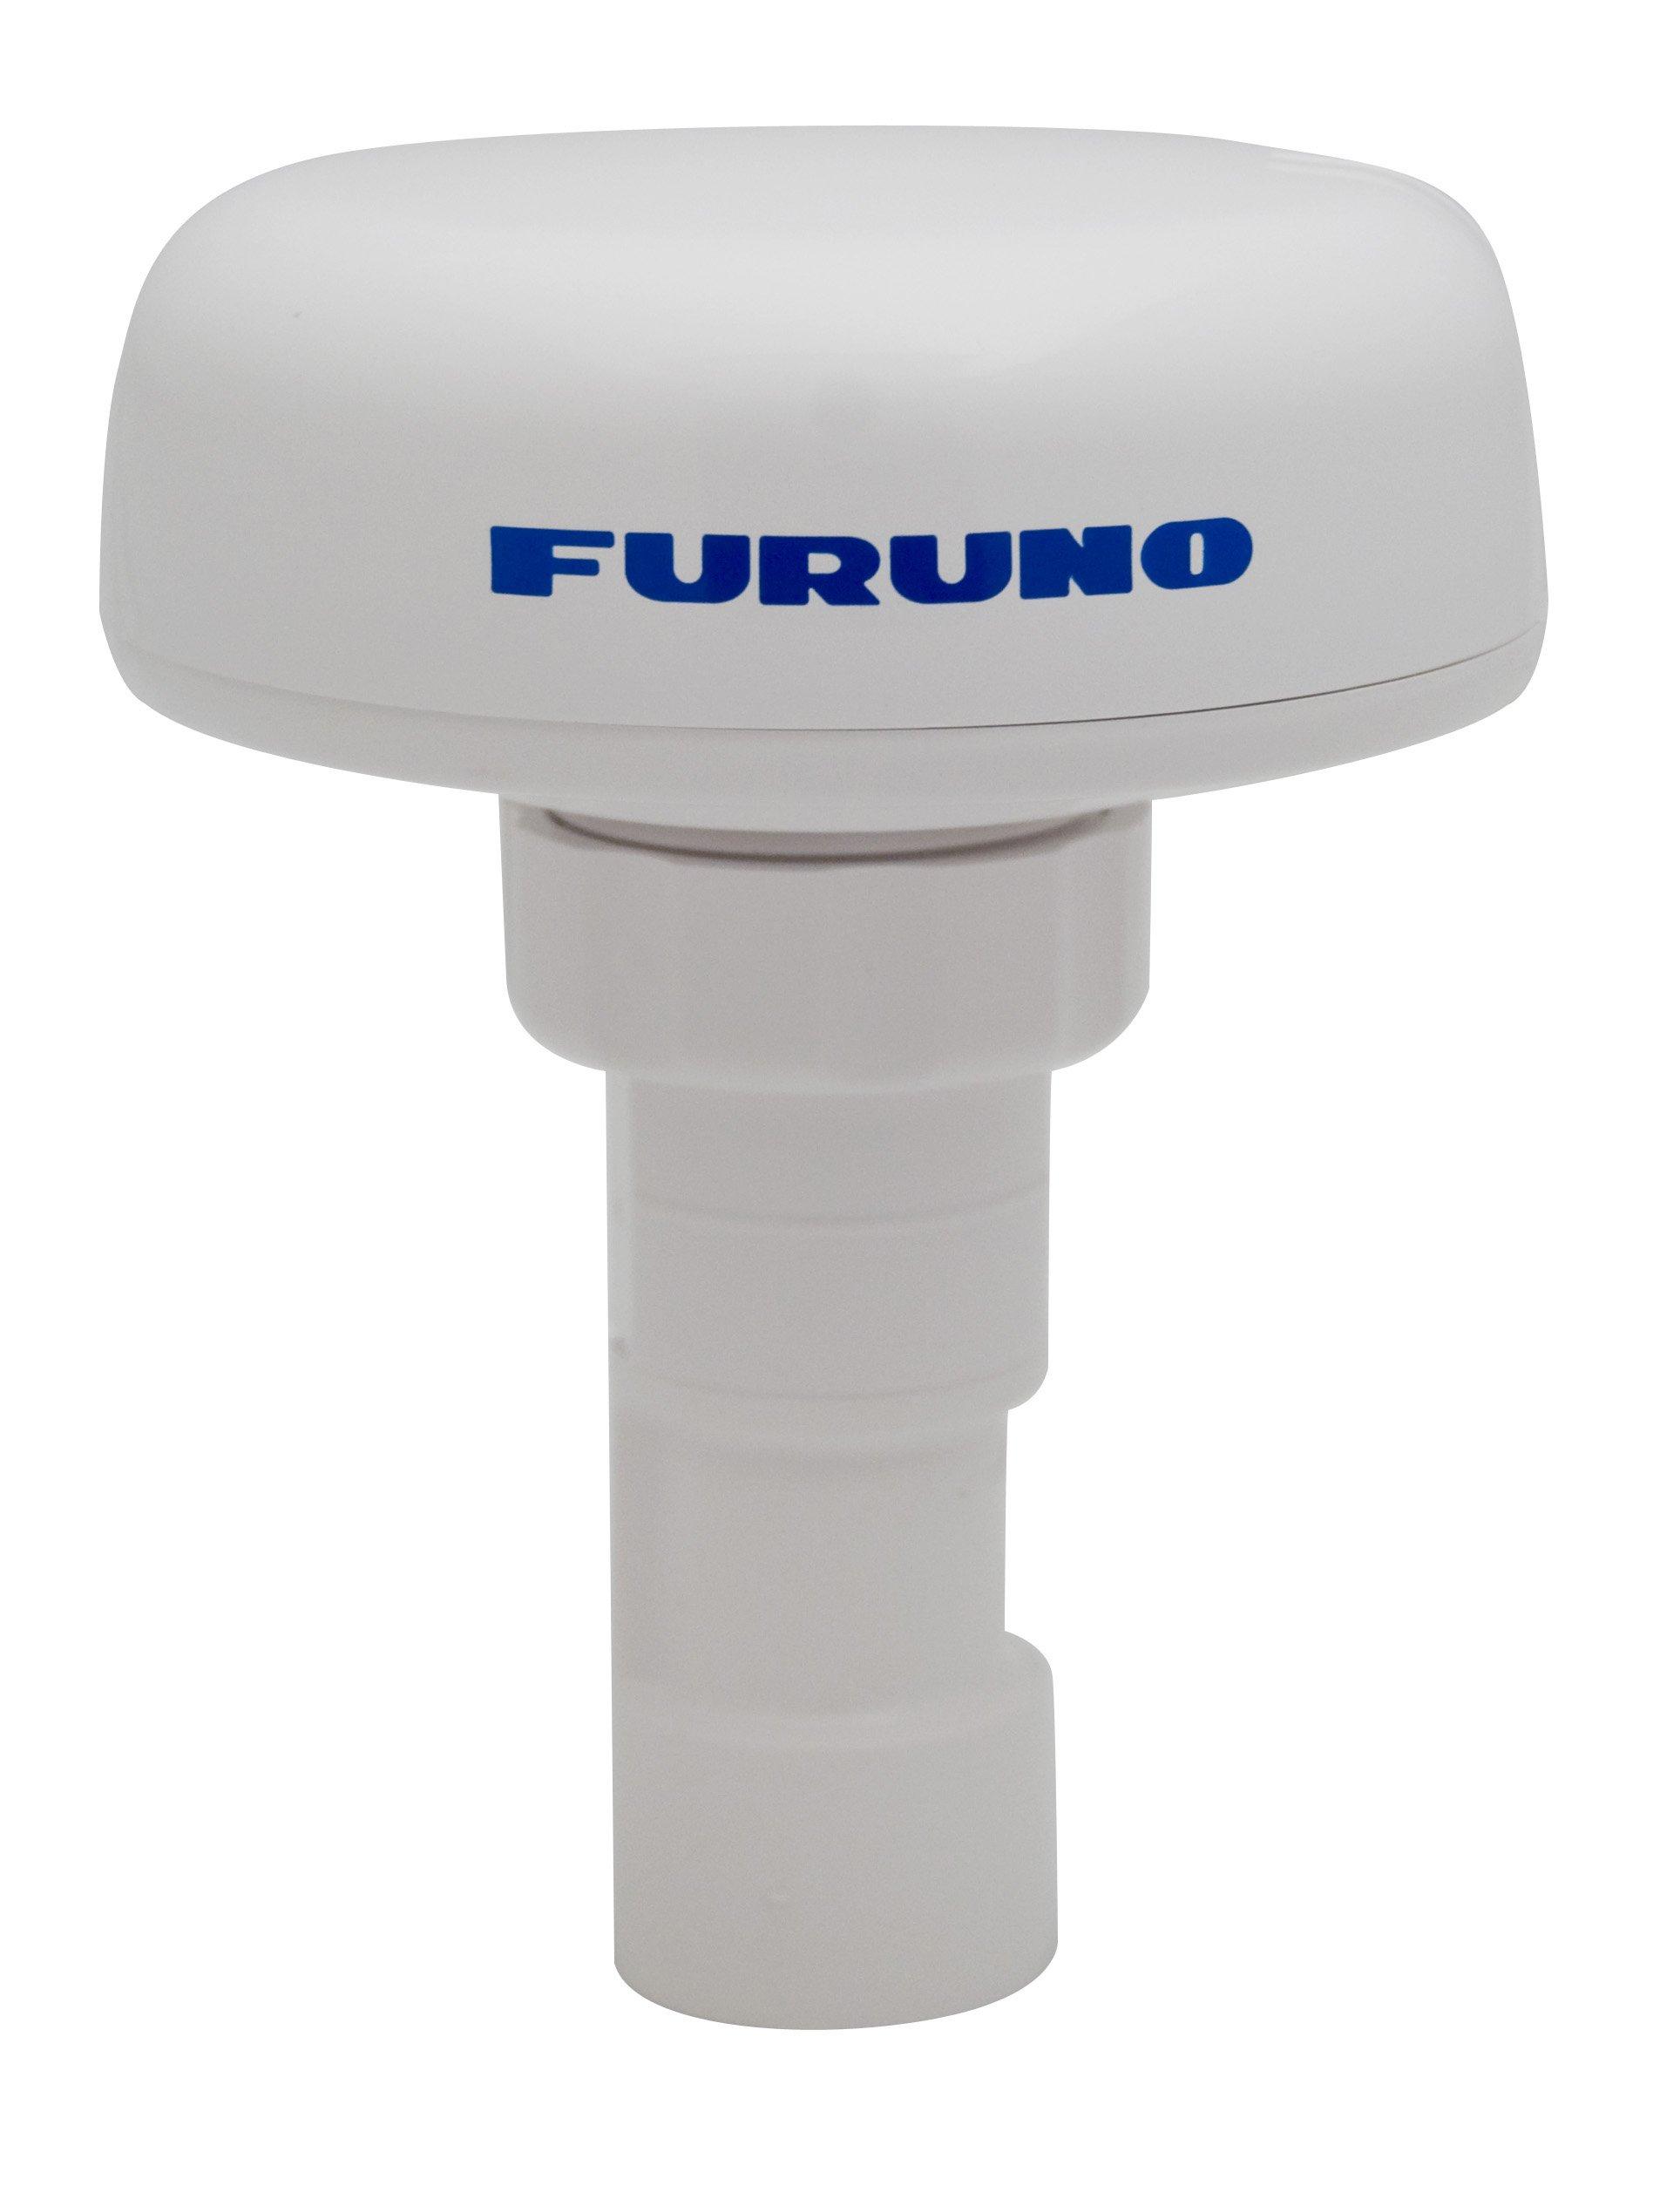 Furuno FUR-GP330B GPS Antenna/Receiver with 6 Meter Cable by Furuno